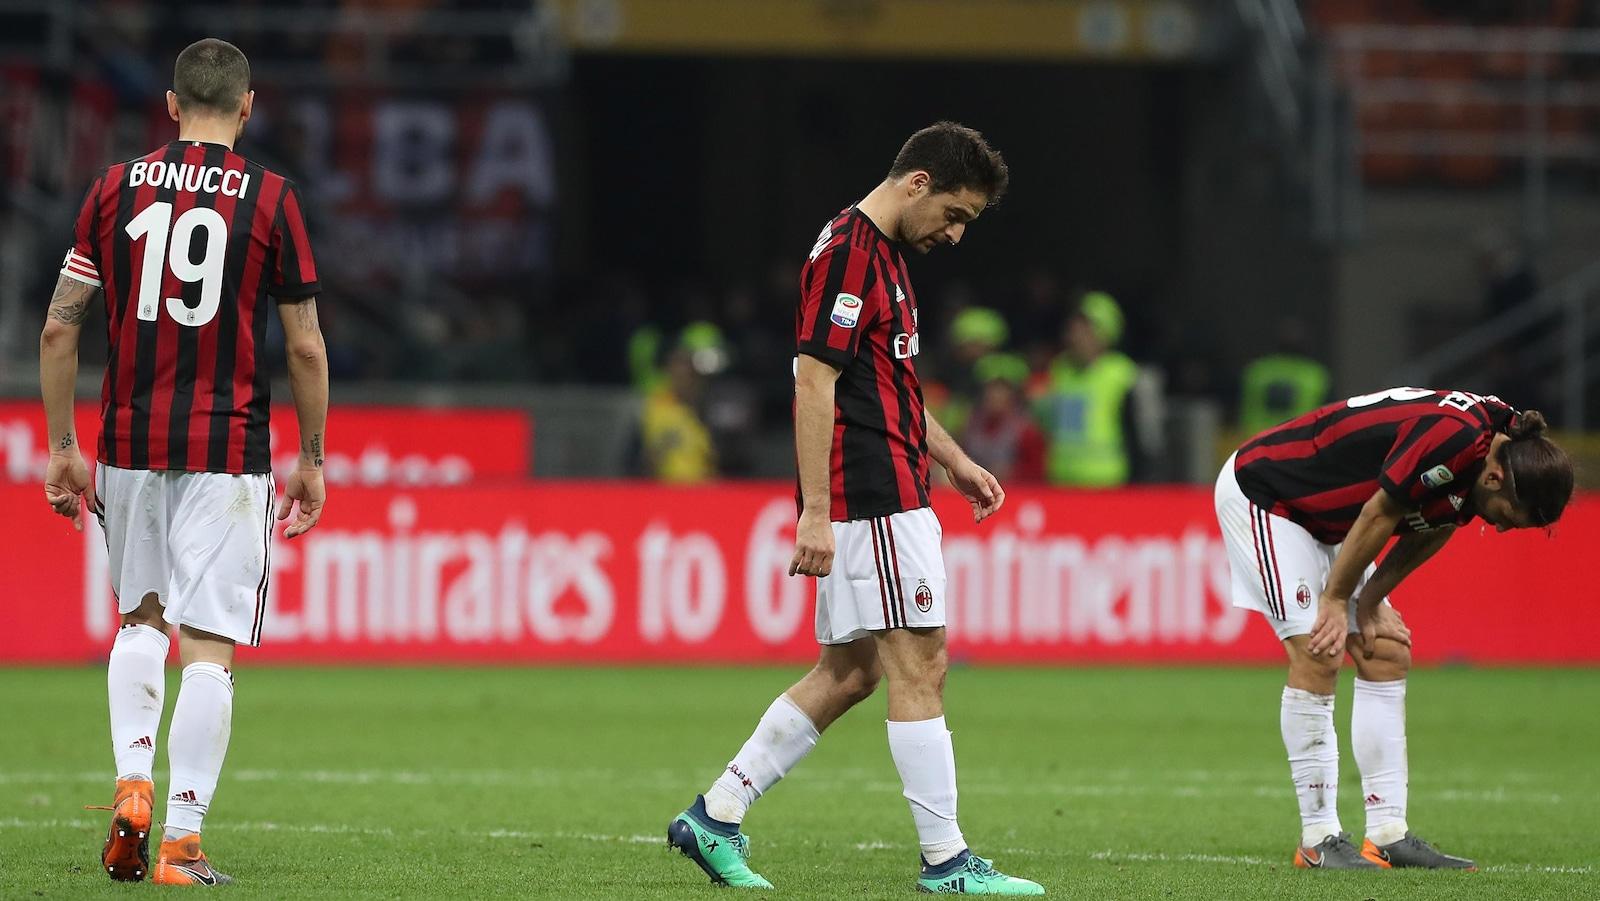 Leonardo Bonucci, Giacomo Bonaventura et Ricardo Rodriguez sont tristes sur le terrain.